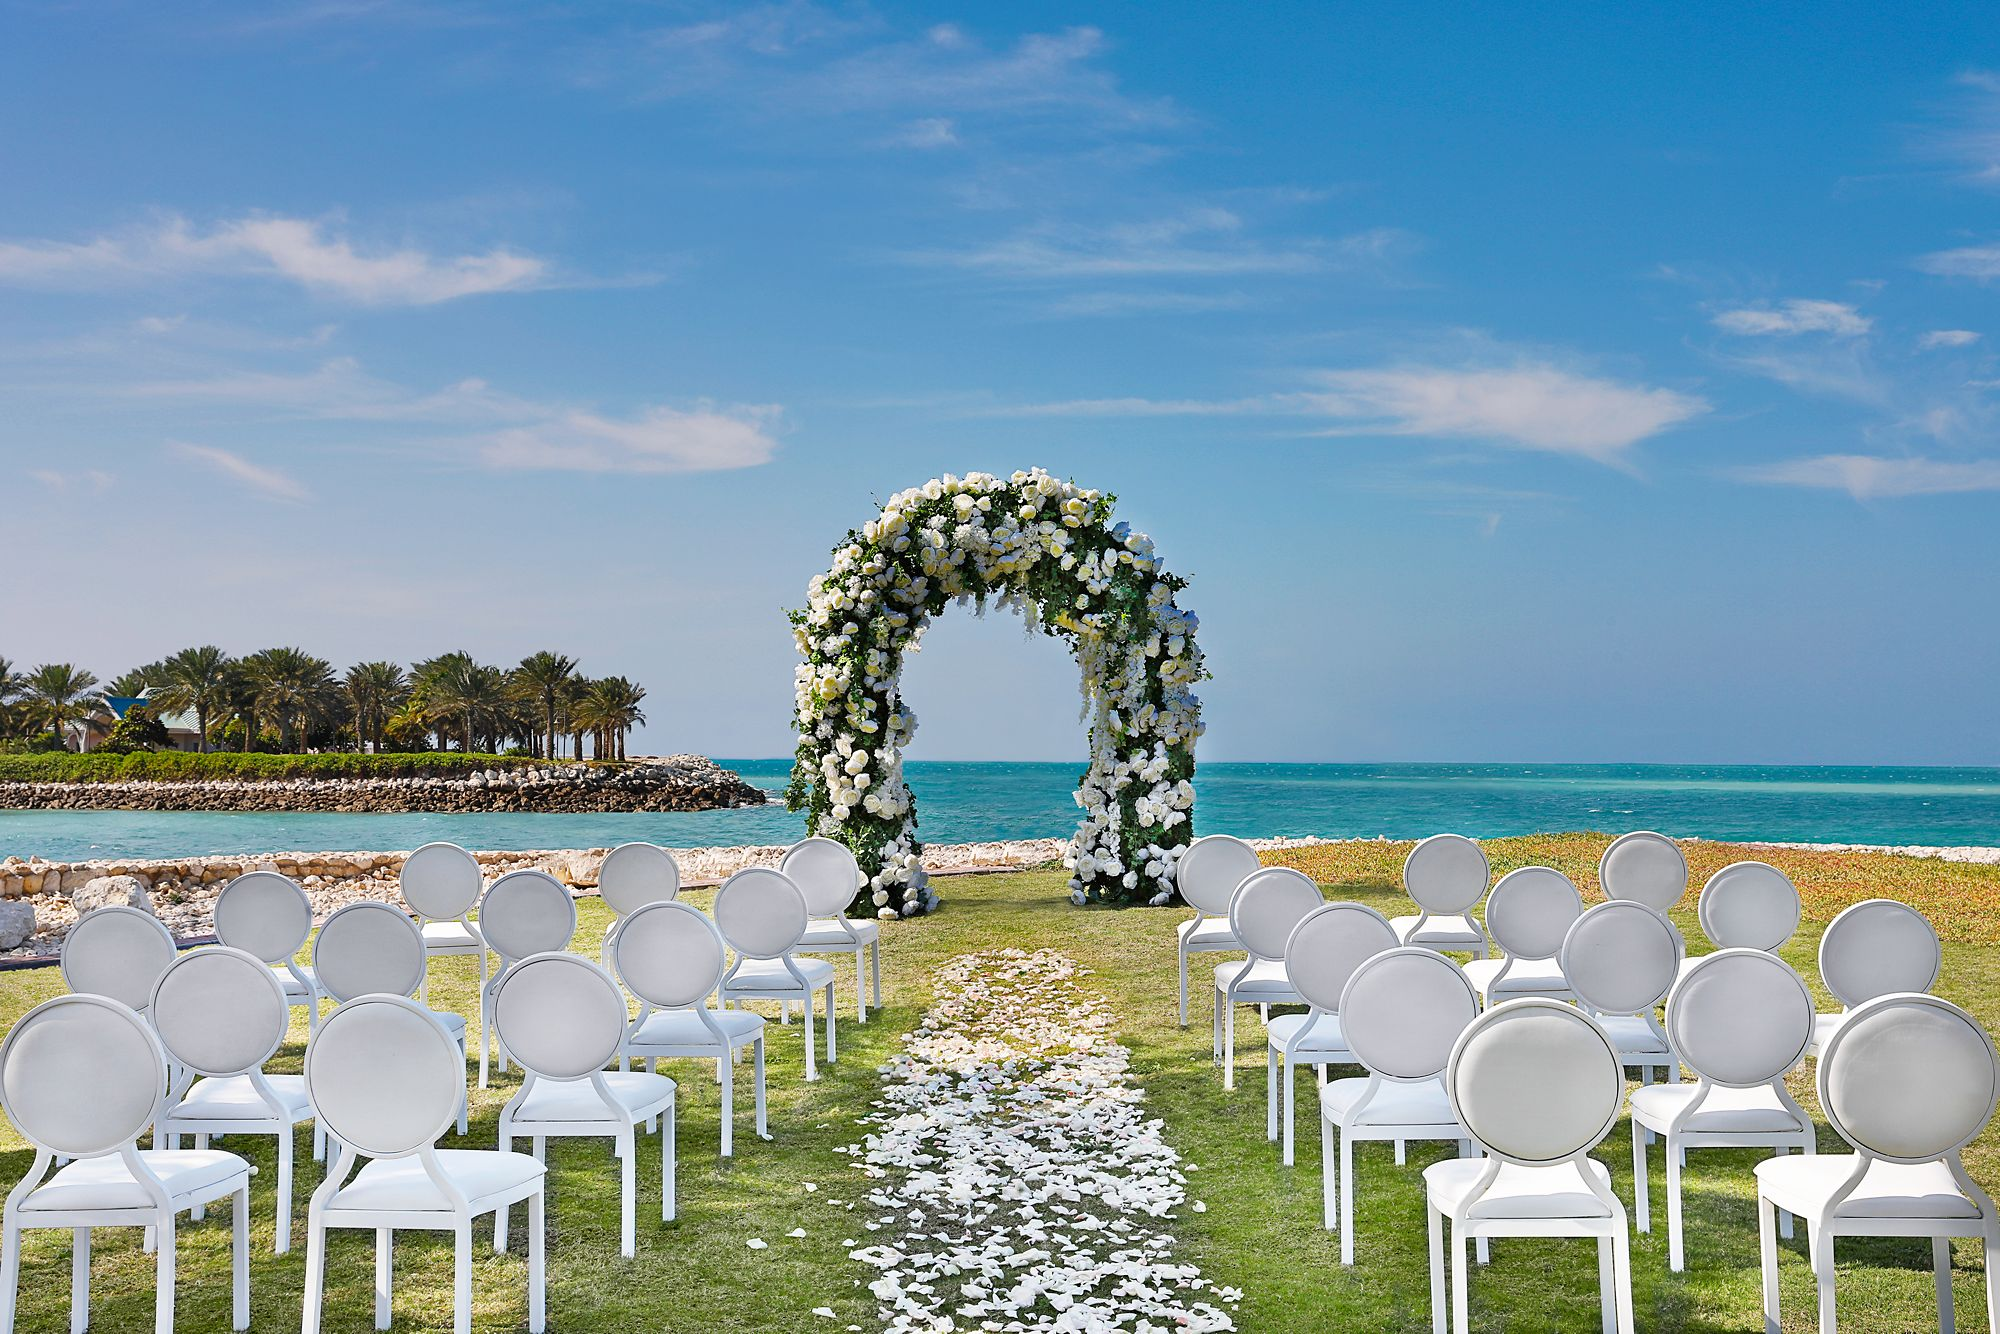 Pleasing Wedding Packages Bahrain Bahrain Honeymoon The Ritz Download Free Architecture Designs Sospemadebymaigaardcom